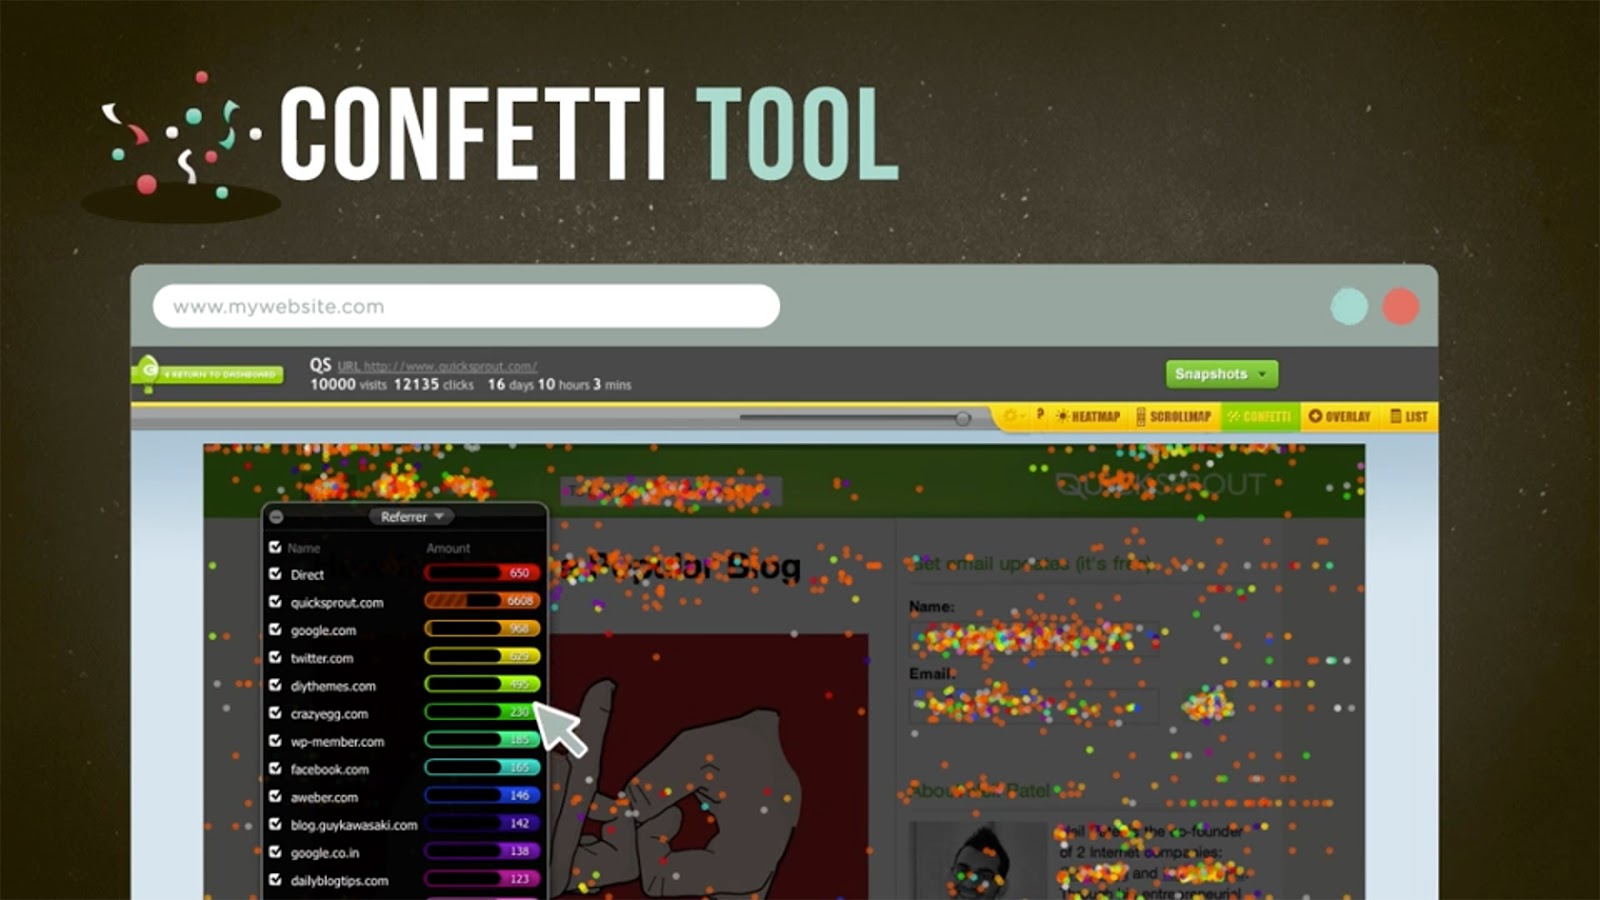 Image of CrazyEgg's Confetti tool